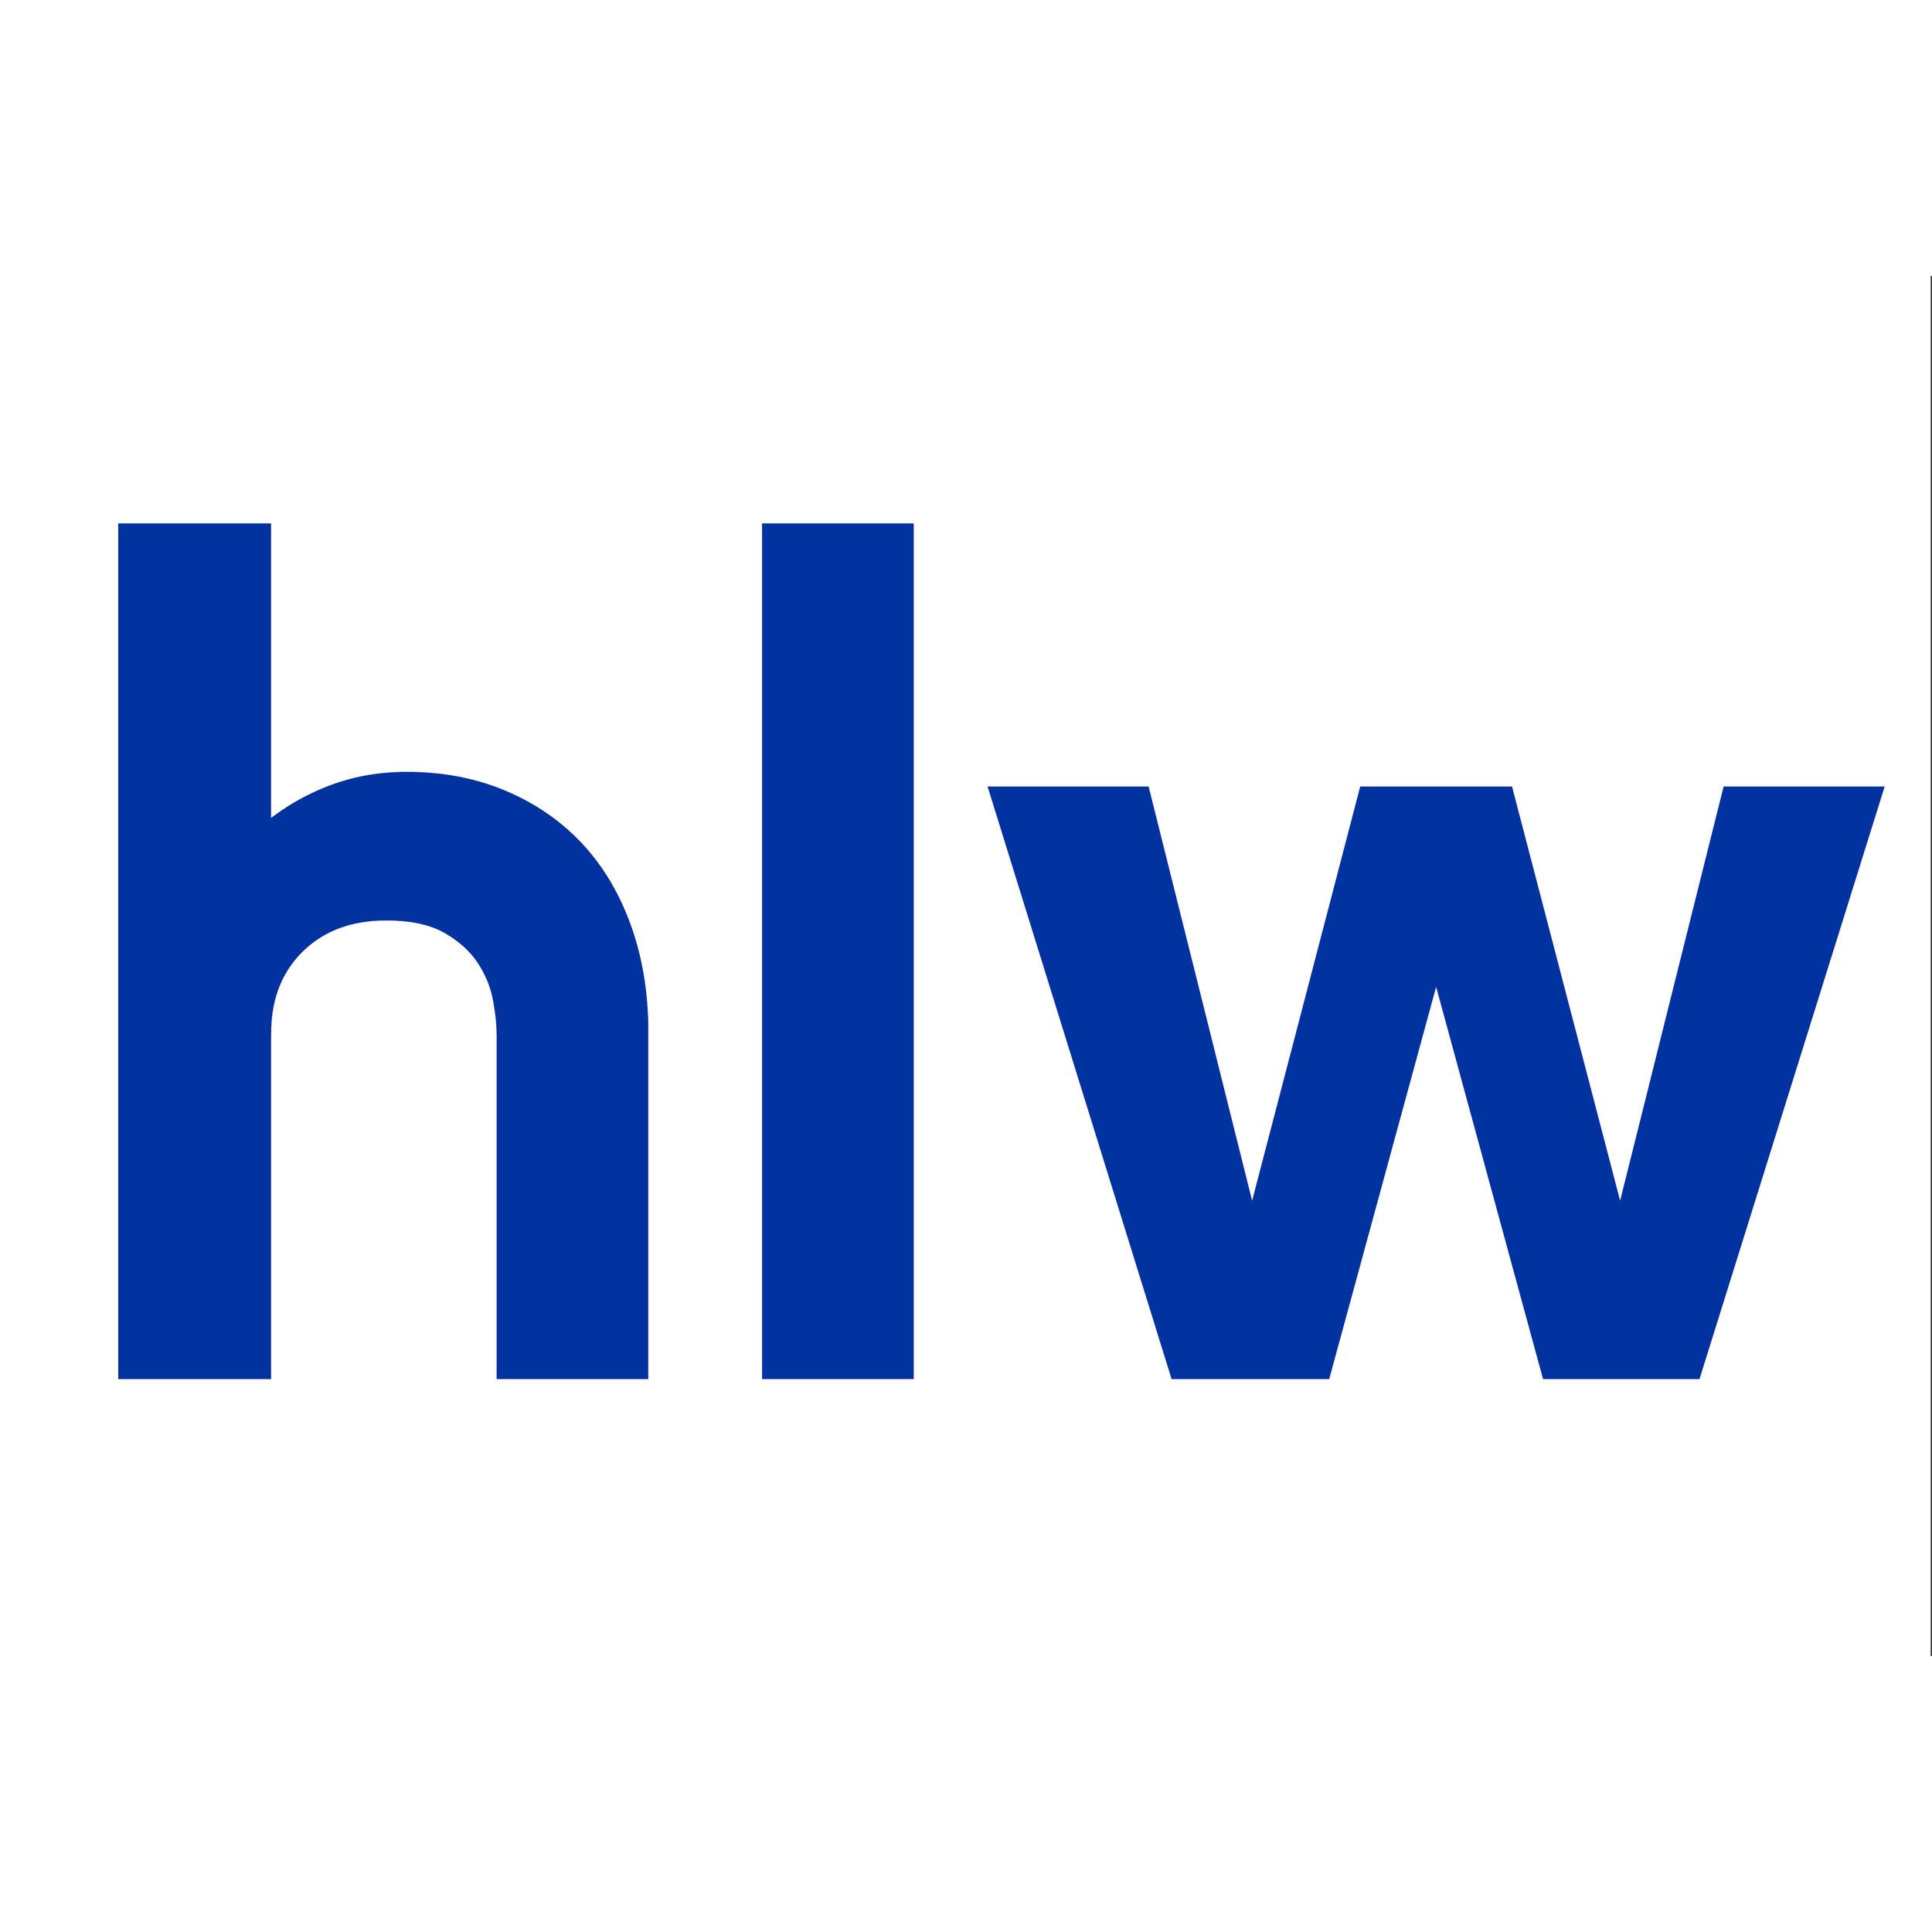 blue HLW logo_digital upload.jpg